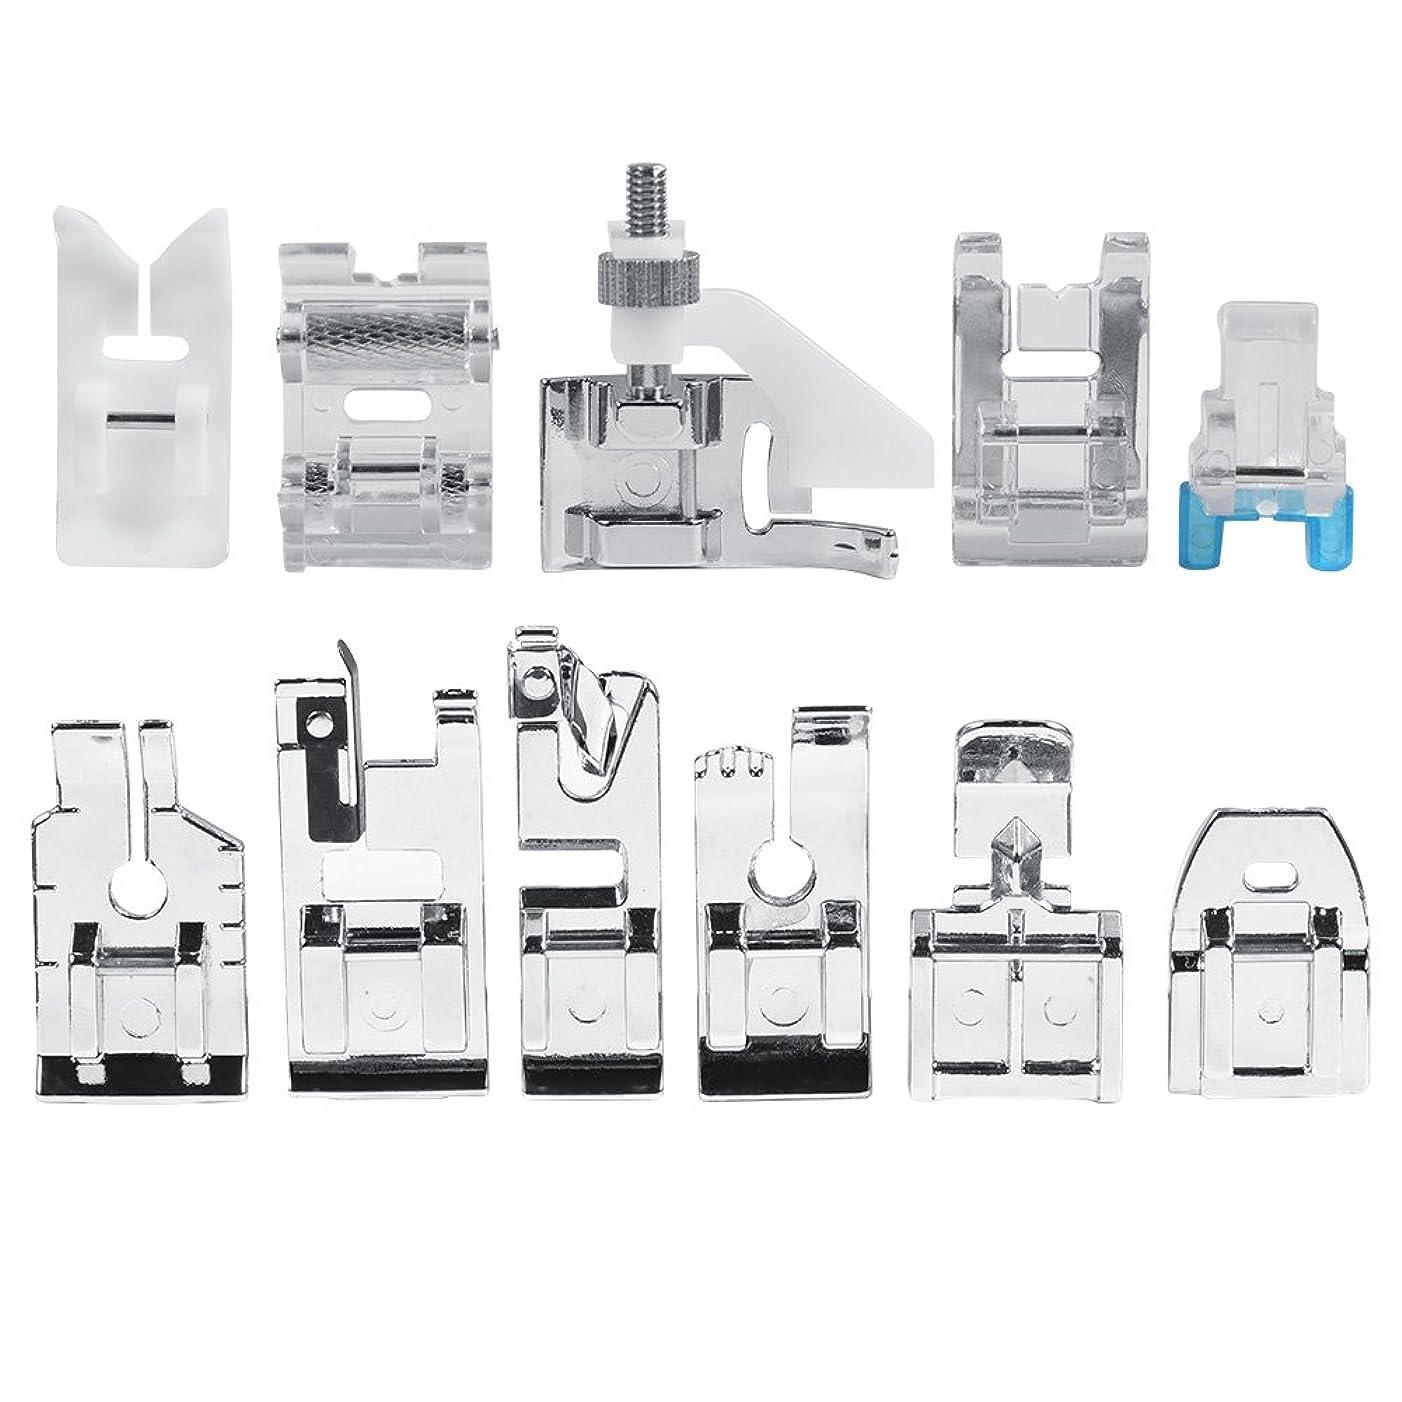 11pcs/Set Household Sewing Machine Parts Quilting Zipper Walking Foot Presser Feet Kit Multifunctional Household Quilting Parts Crafts Sewing